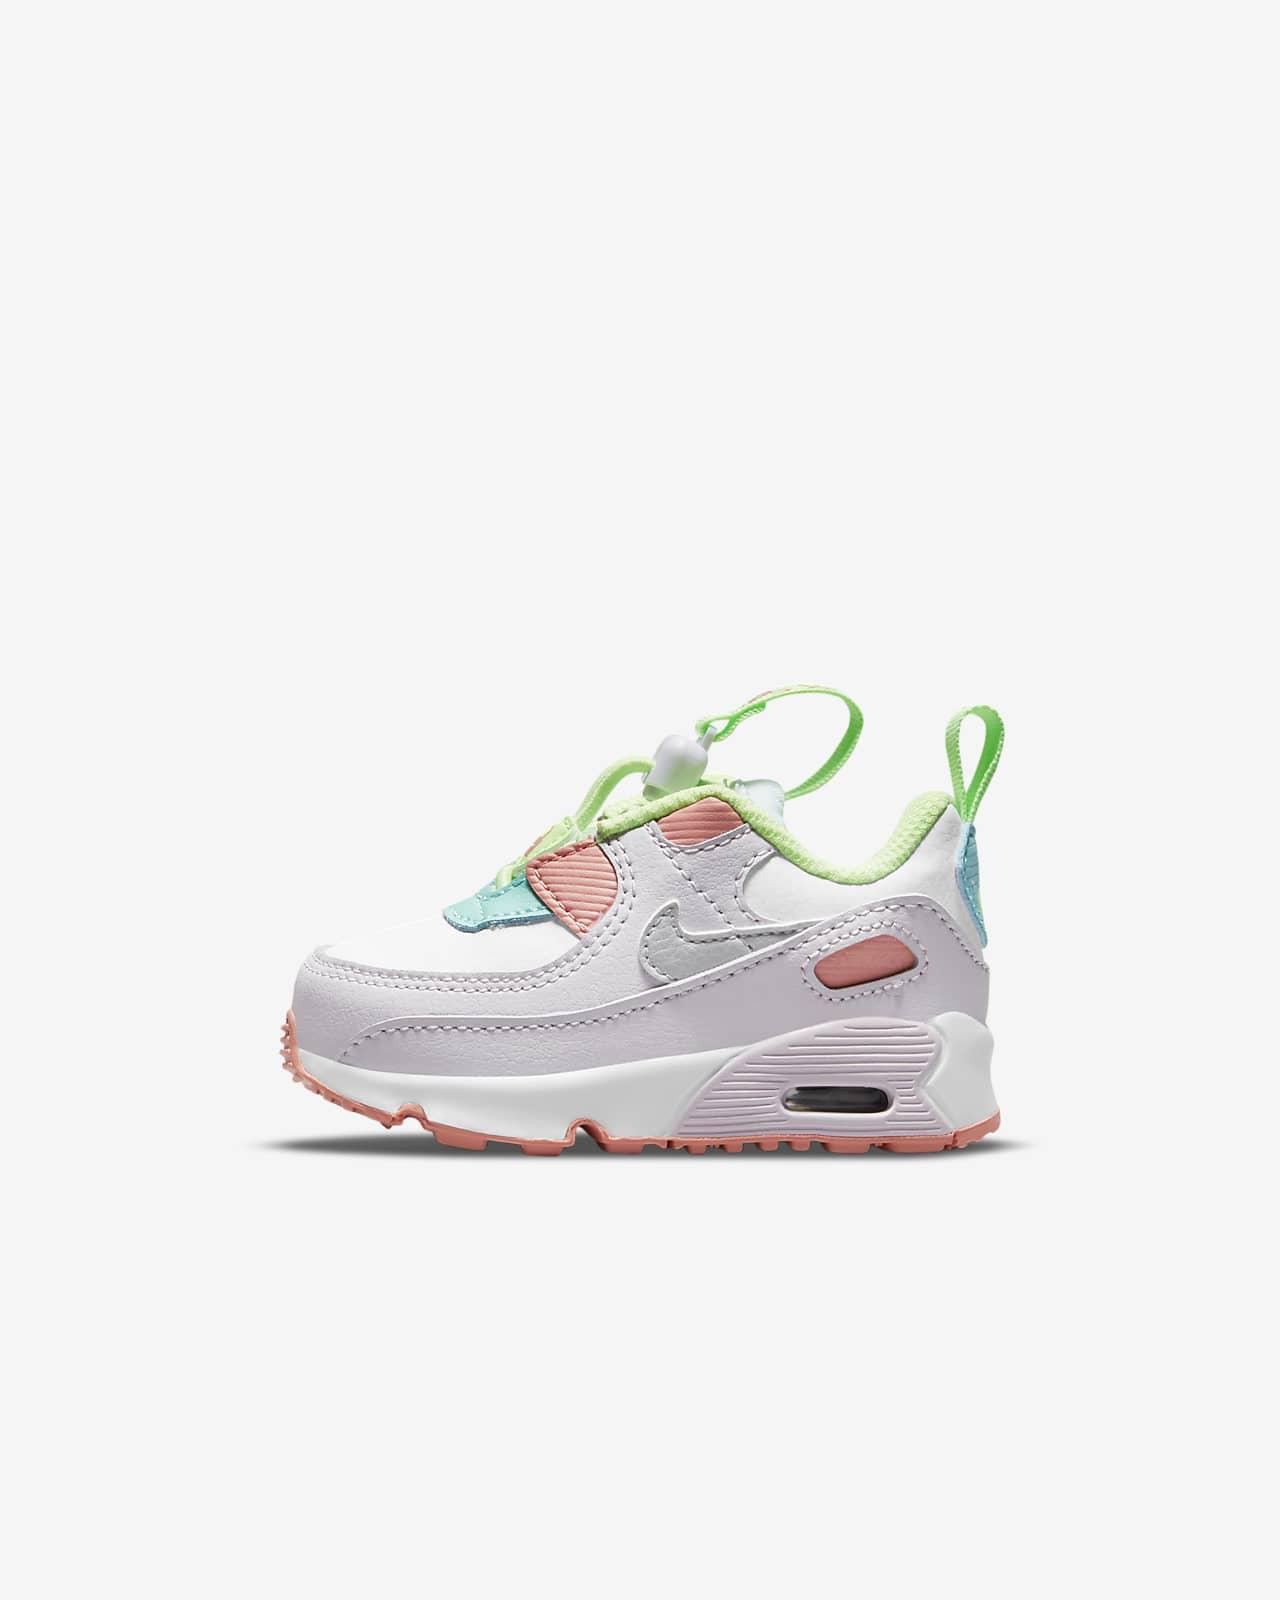 Nike Air Max 90 Toggle Baby & Toddler Shoe